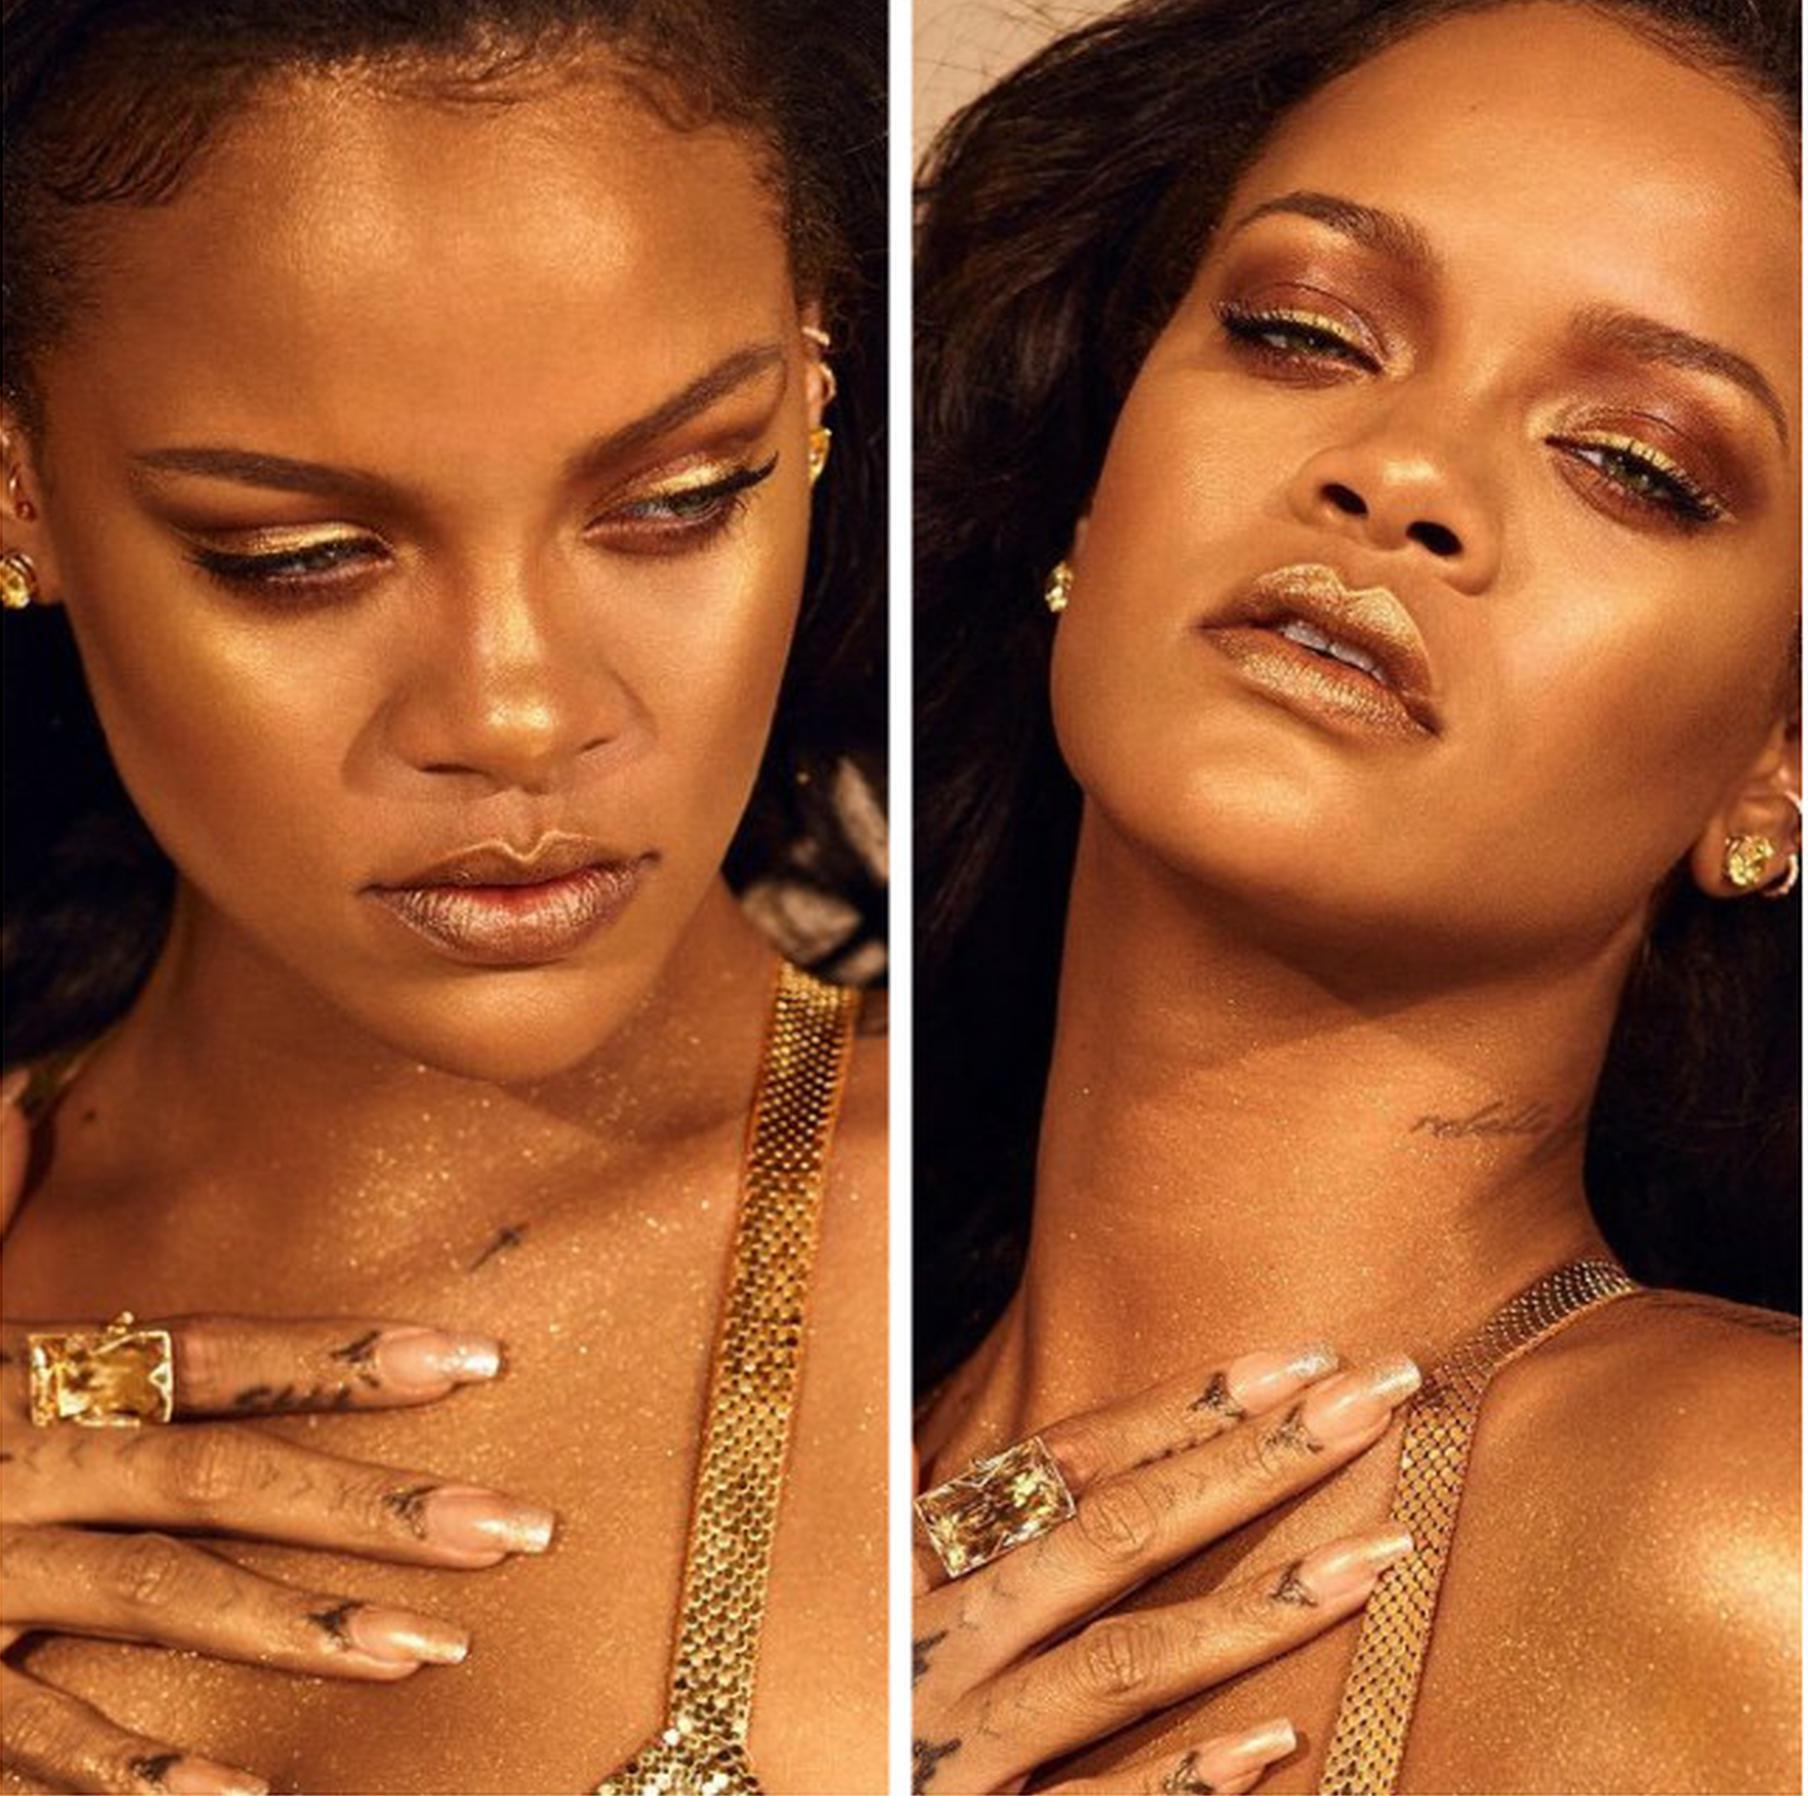 Rihanna亲自出镜身体高光广告大片